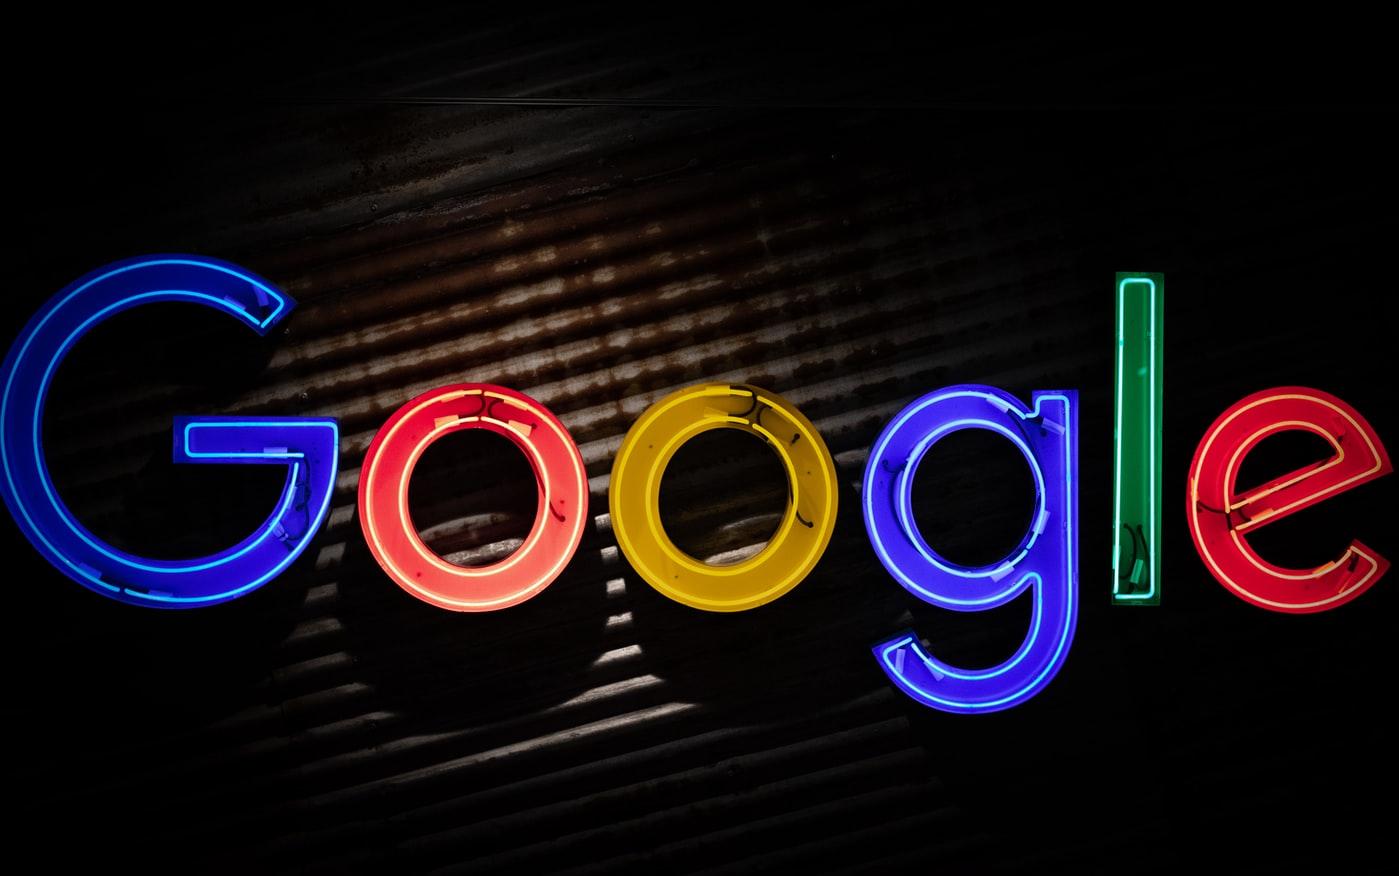 Google: Ανοίγει το πρώτο της φυσικό κατάστημα